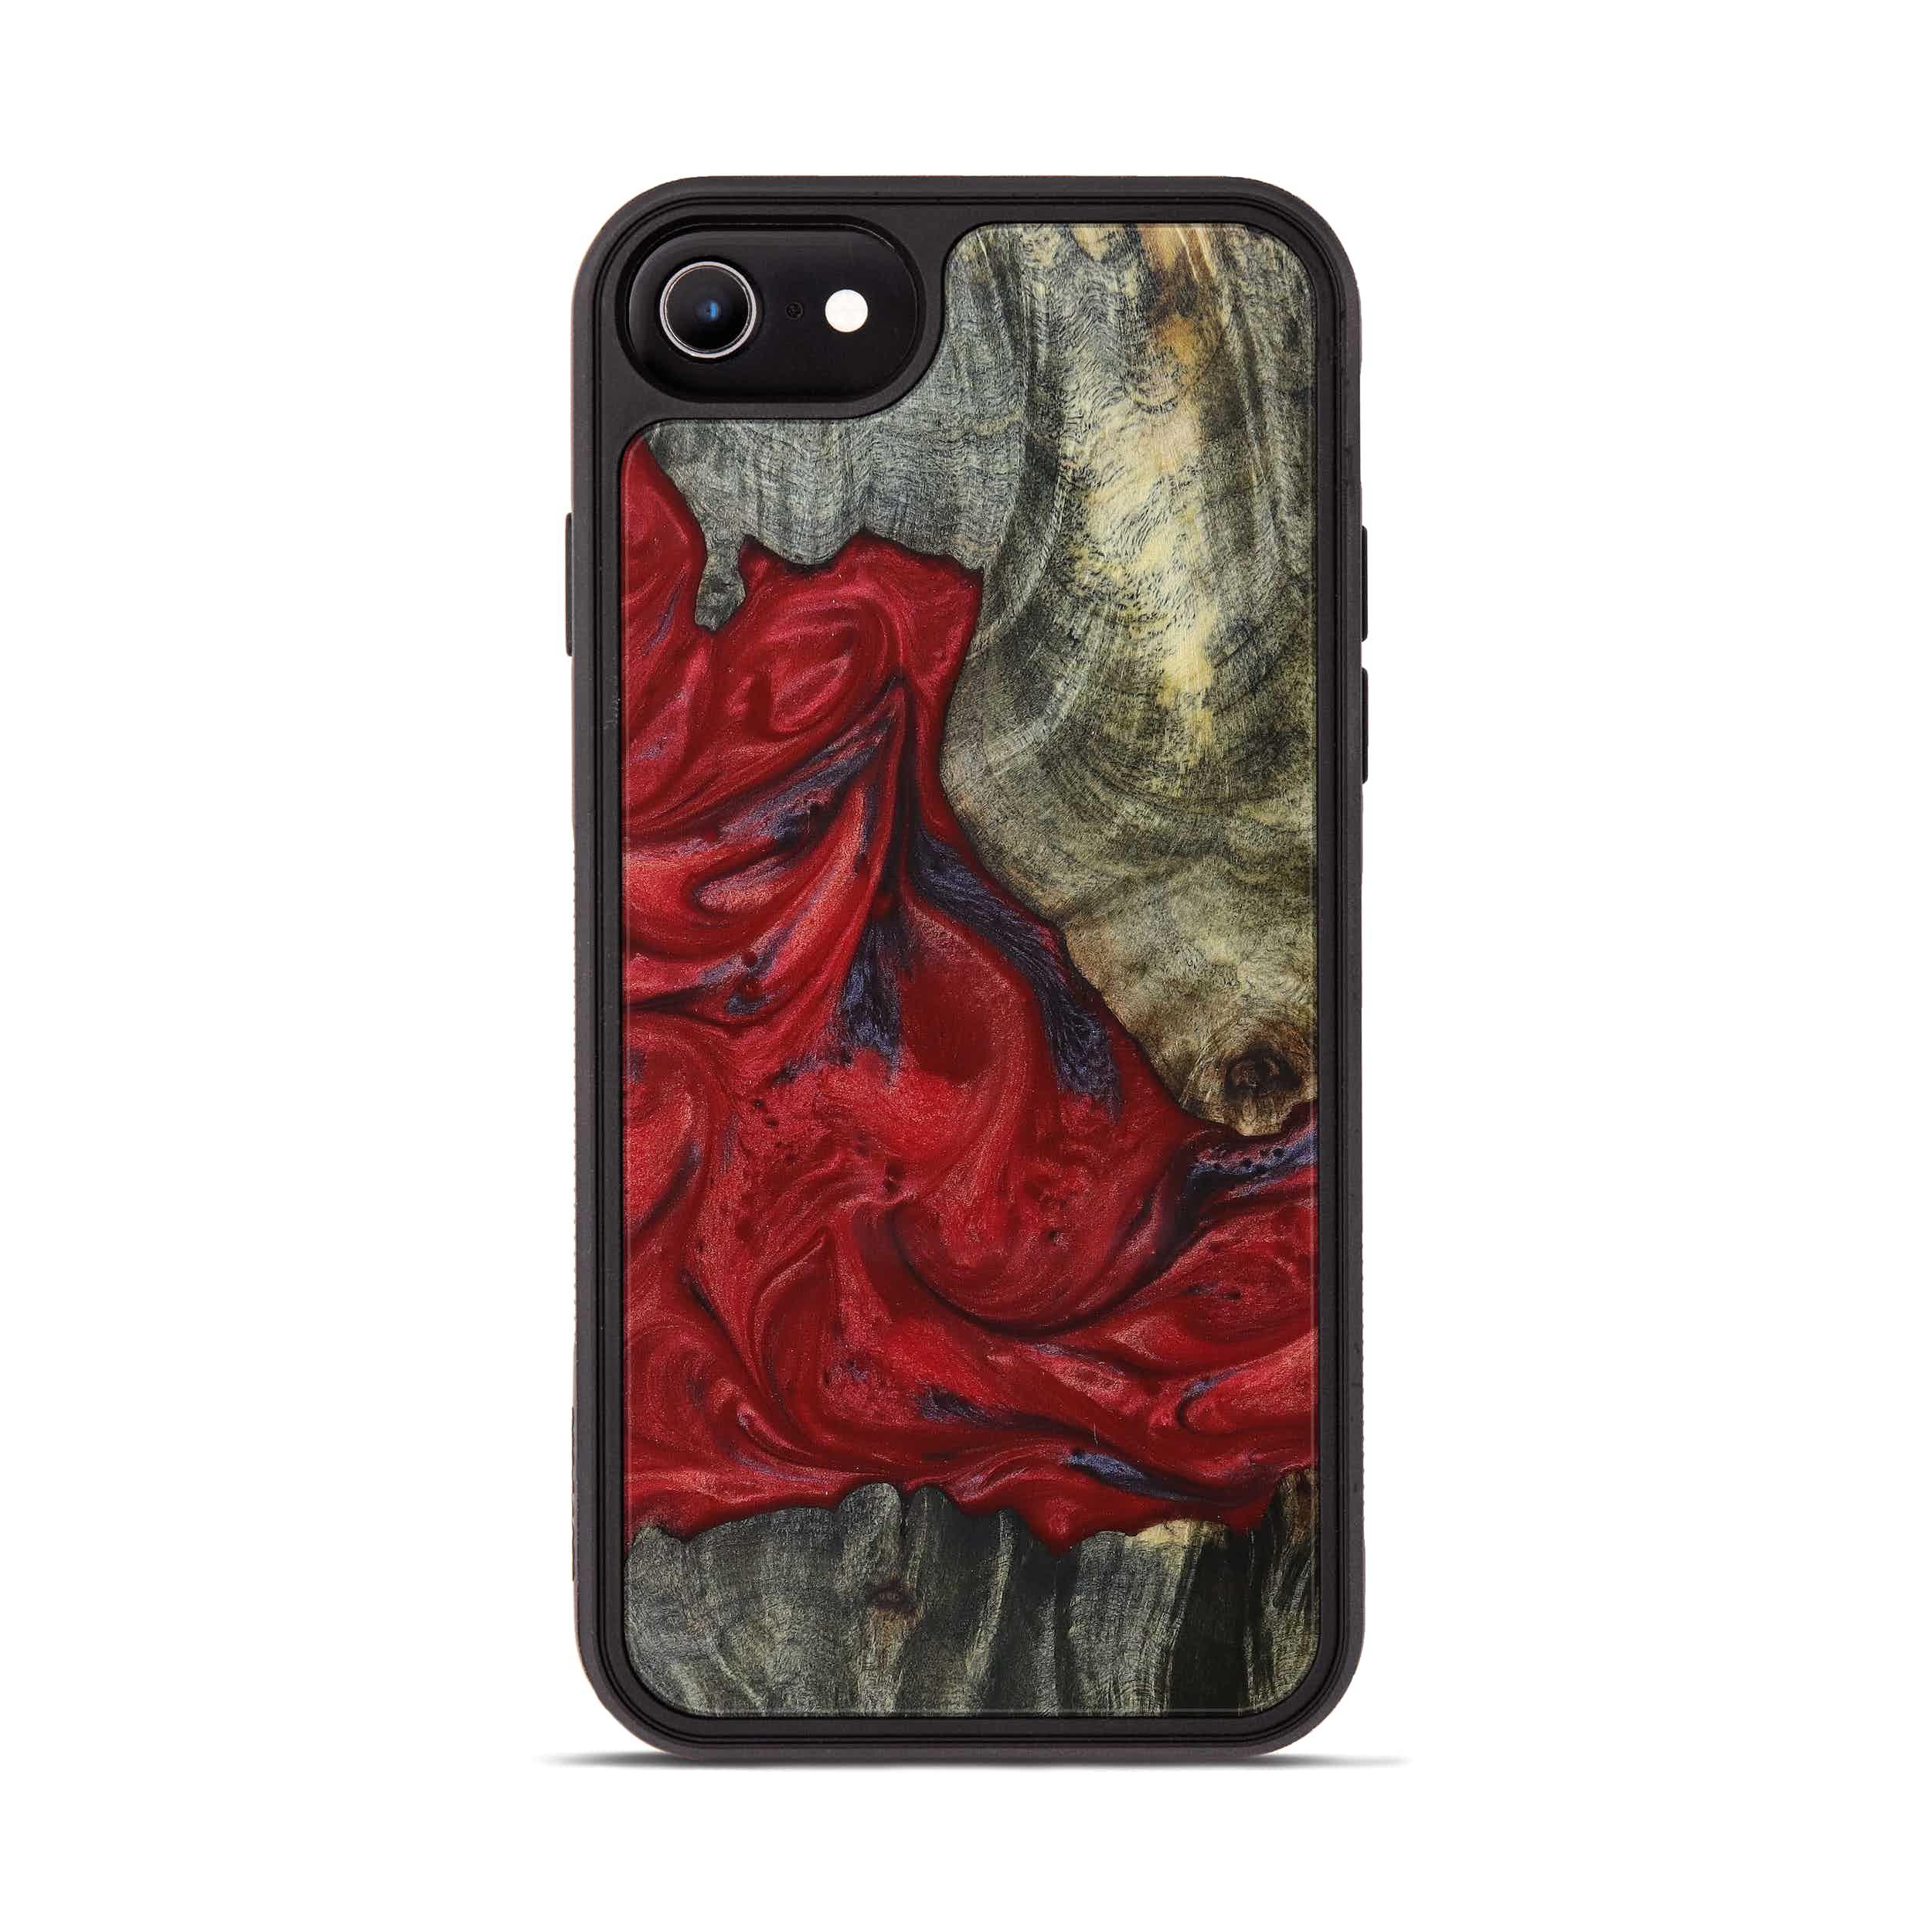 iPhone 8 Wood+Resin Phone Case - Tera (Dark Red, 394327)